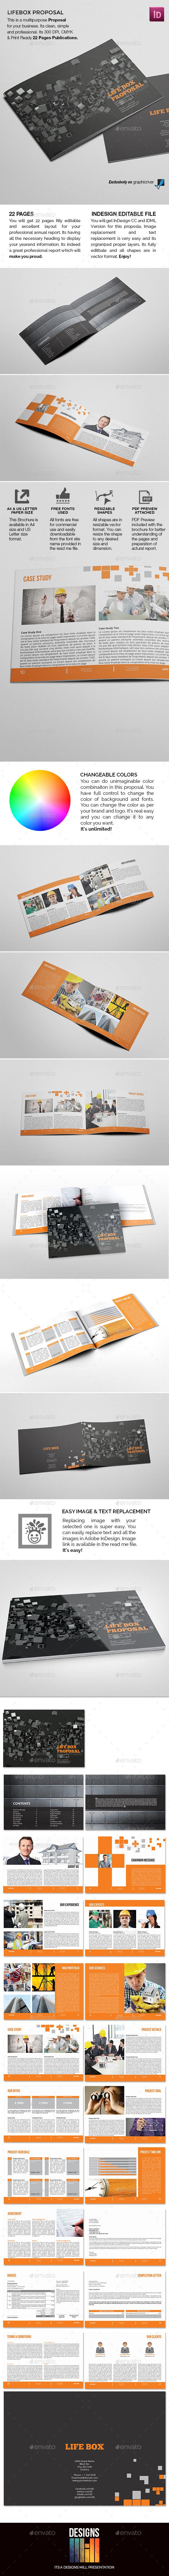 GraphicRiver Lifebox Landscape Proposal 9174909